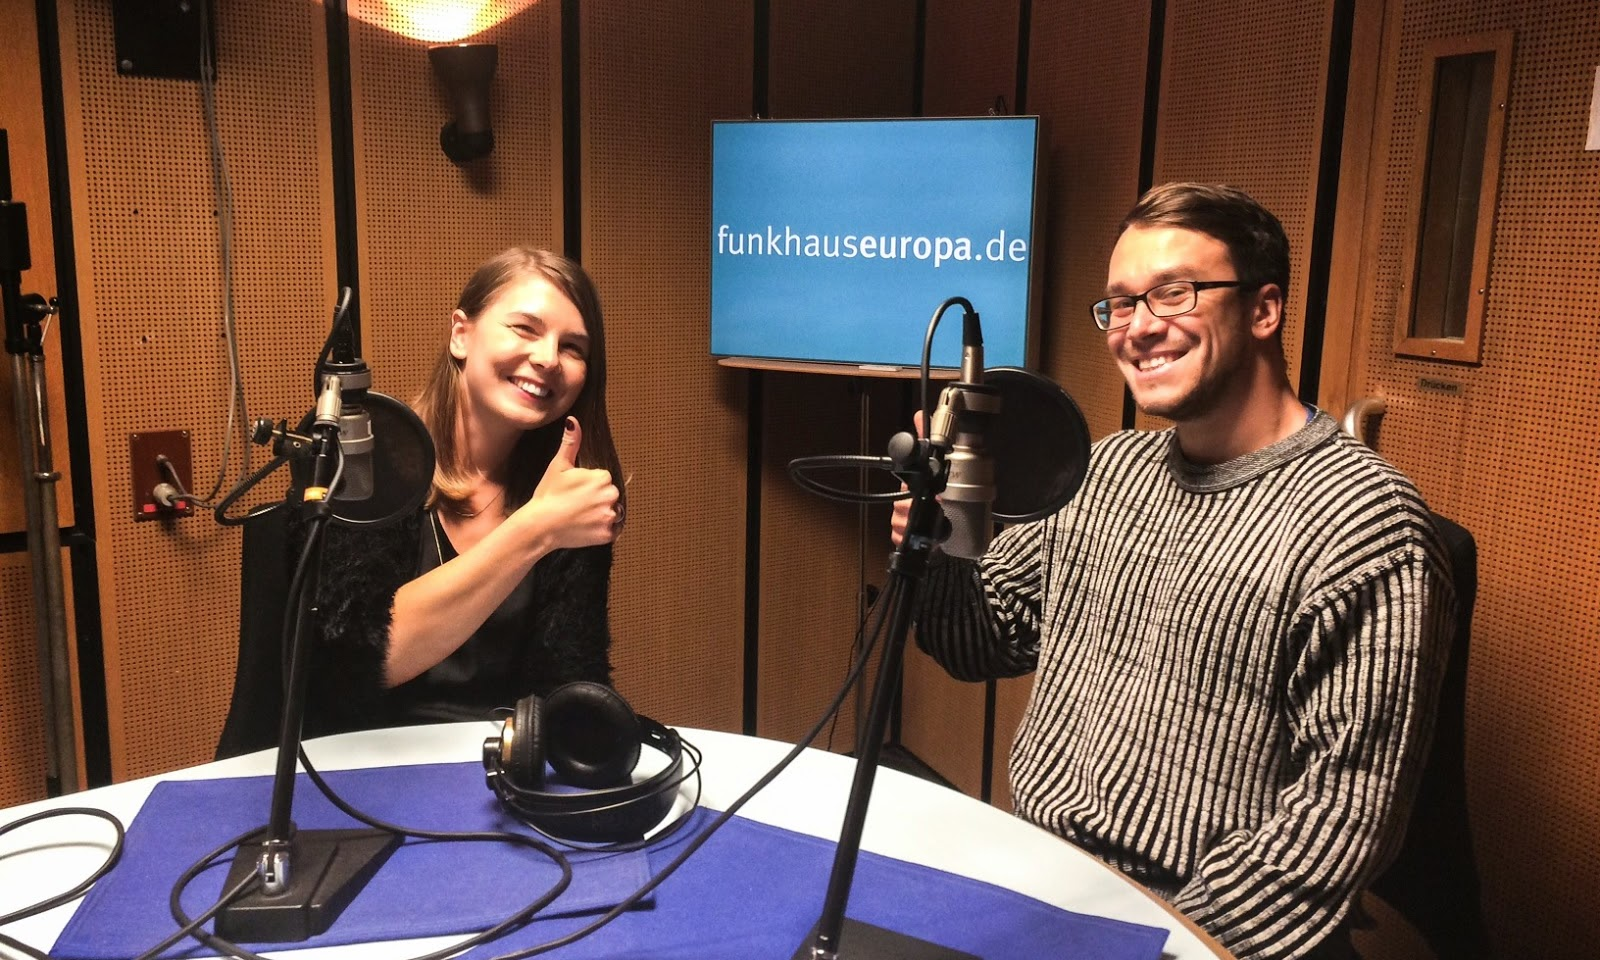 Radio Funkhaus Europa